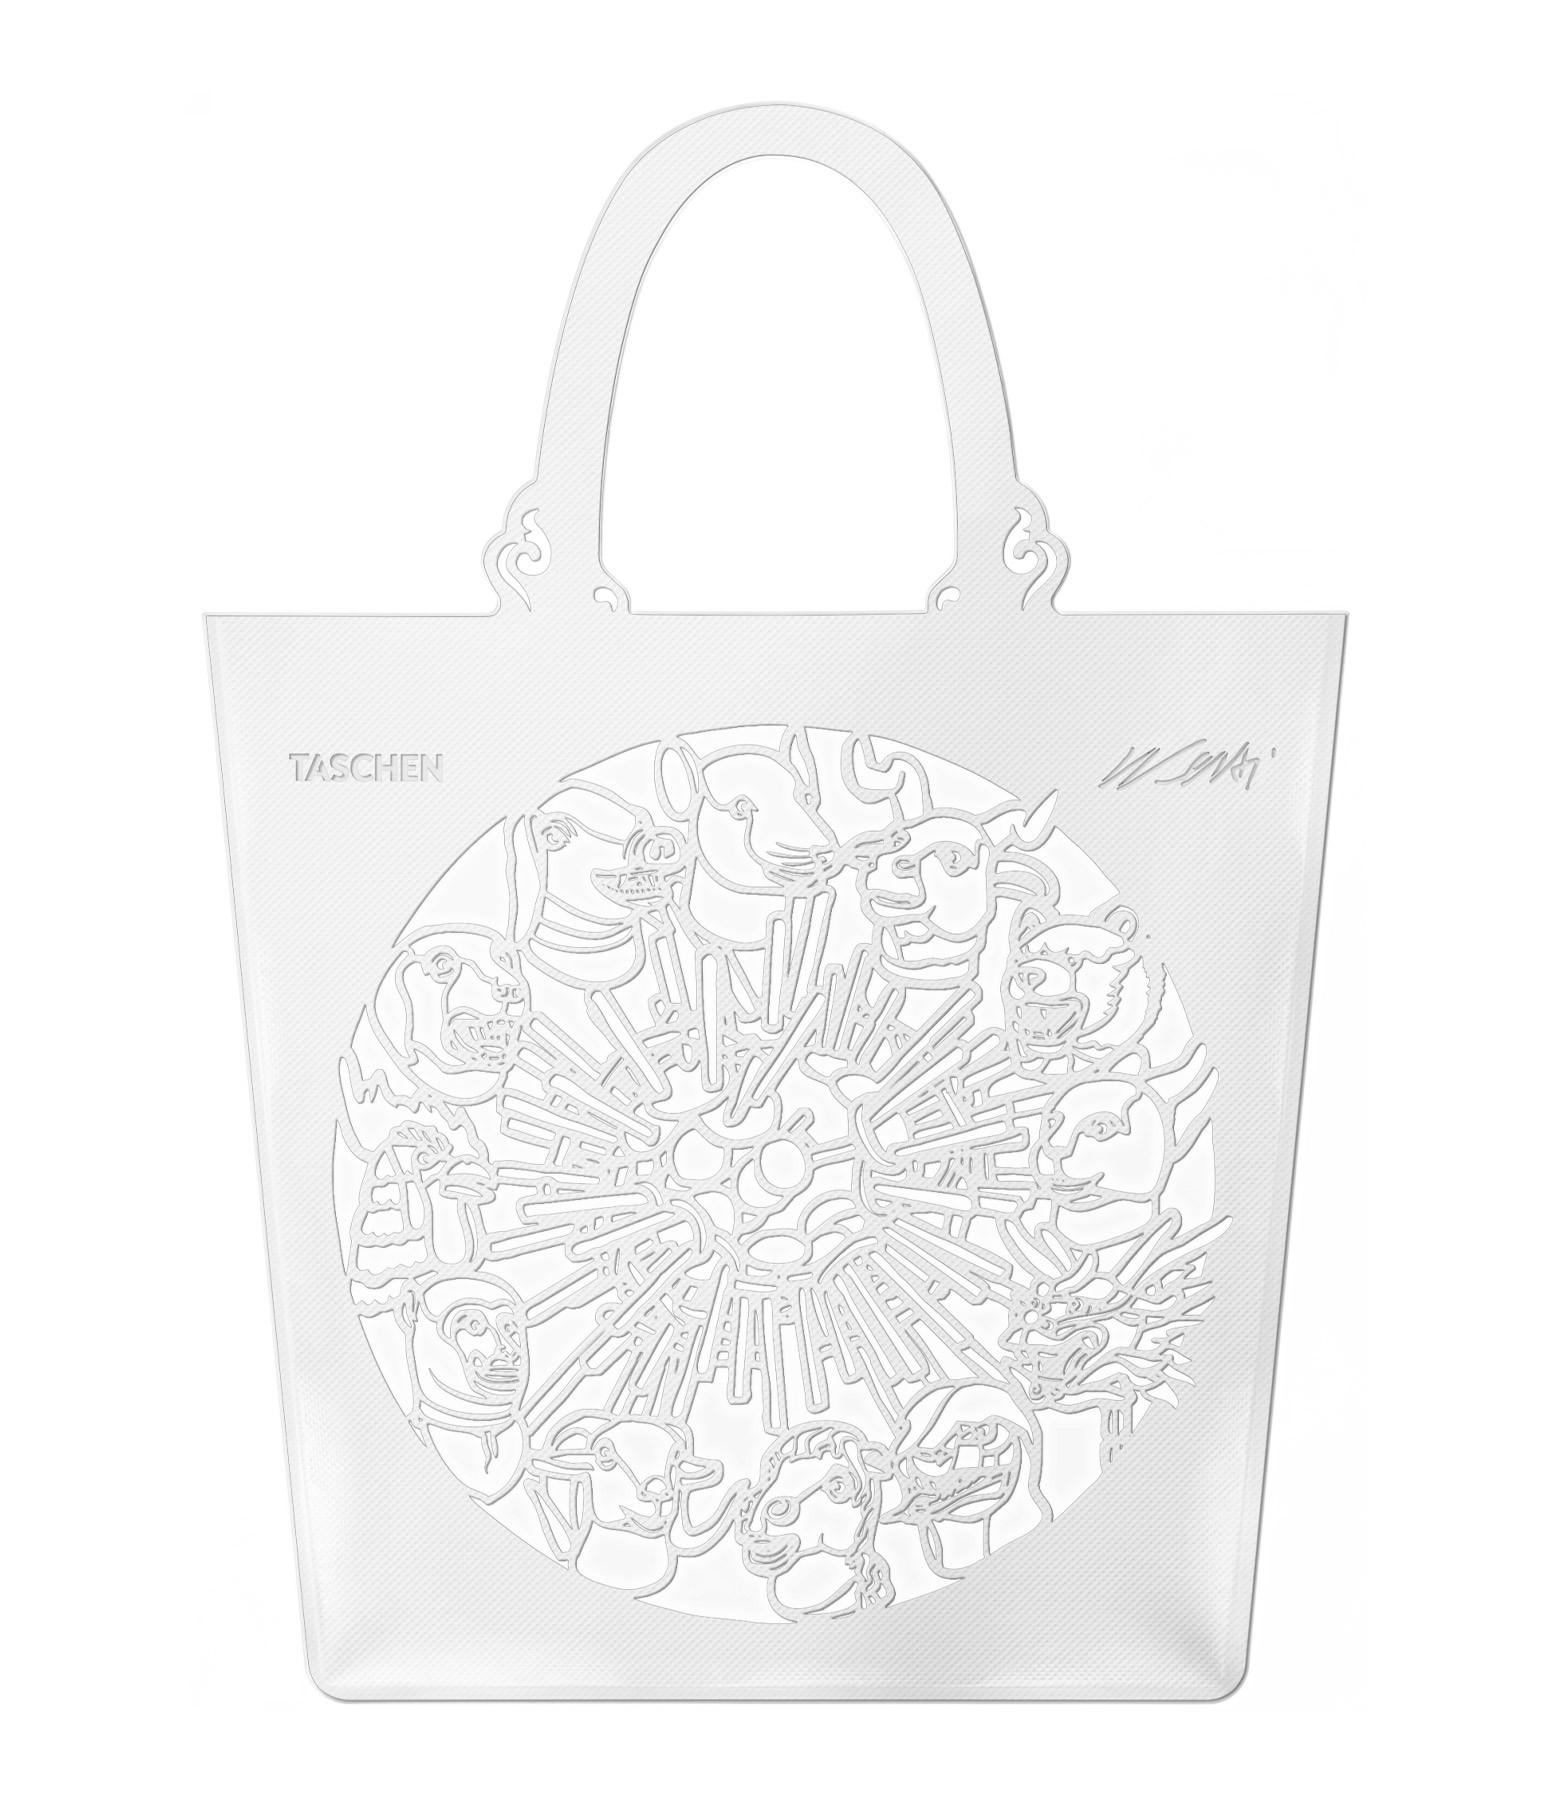 TASCHEN - Sac The China Bag